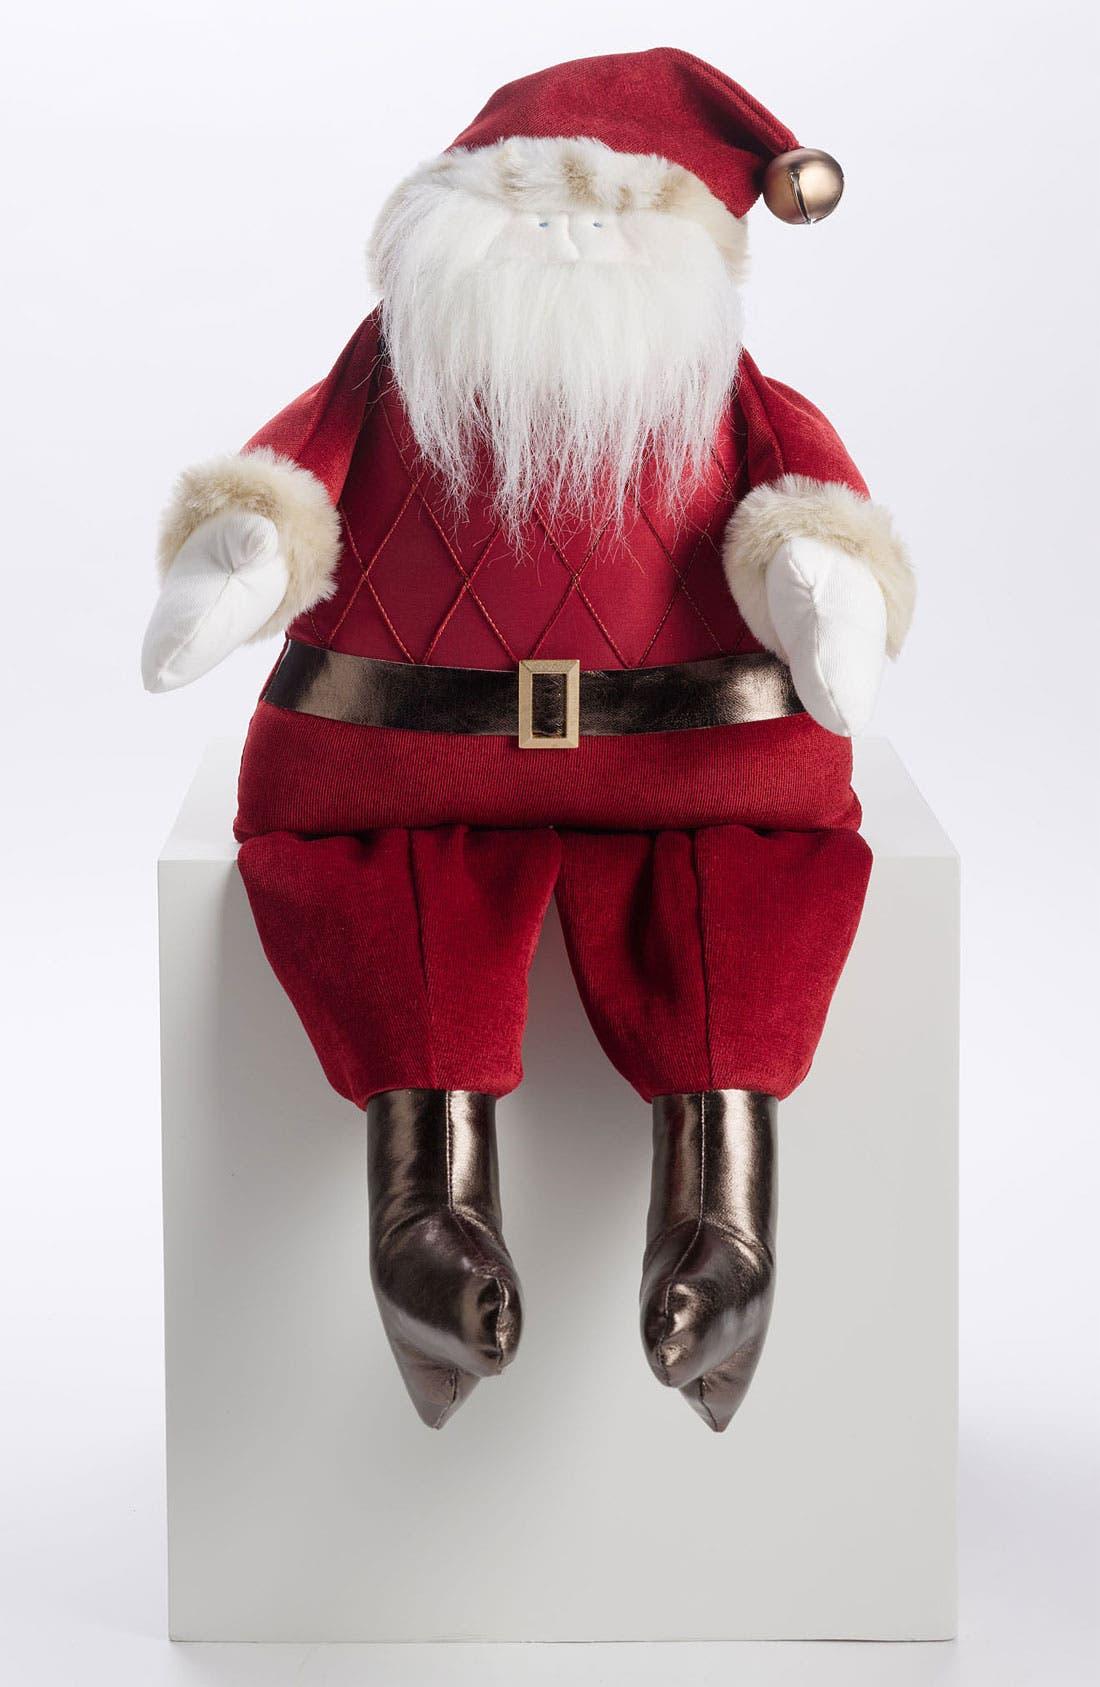 Main Image - Woof & Poof 'Extra Large' Musical Jolly Santa Decoration